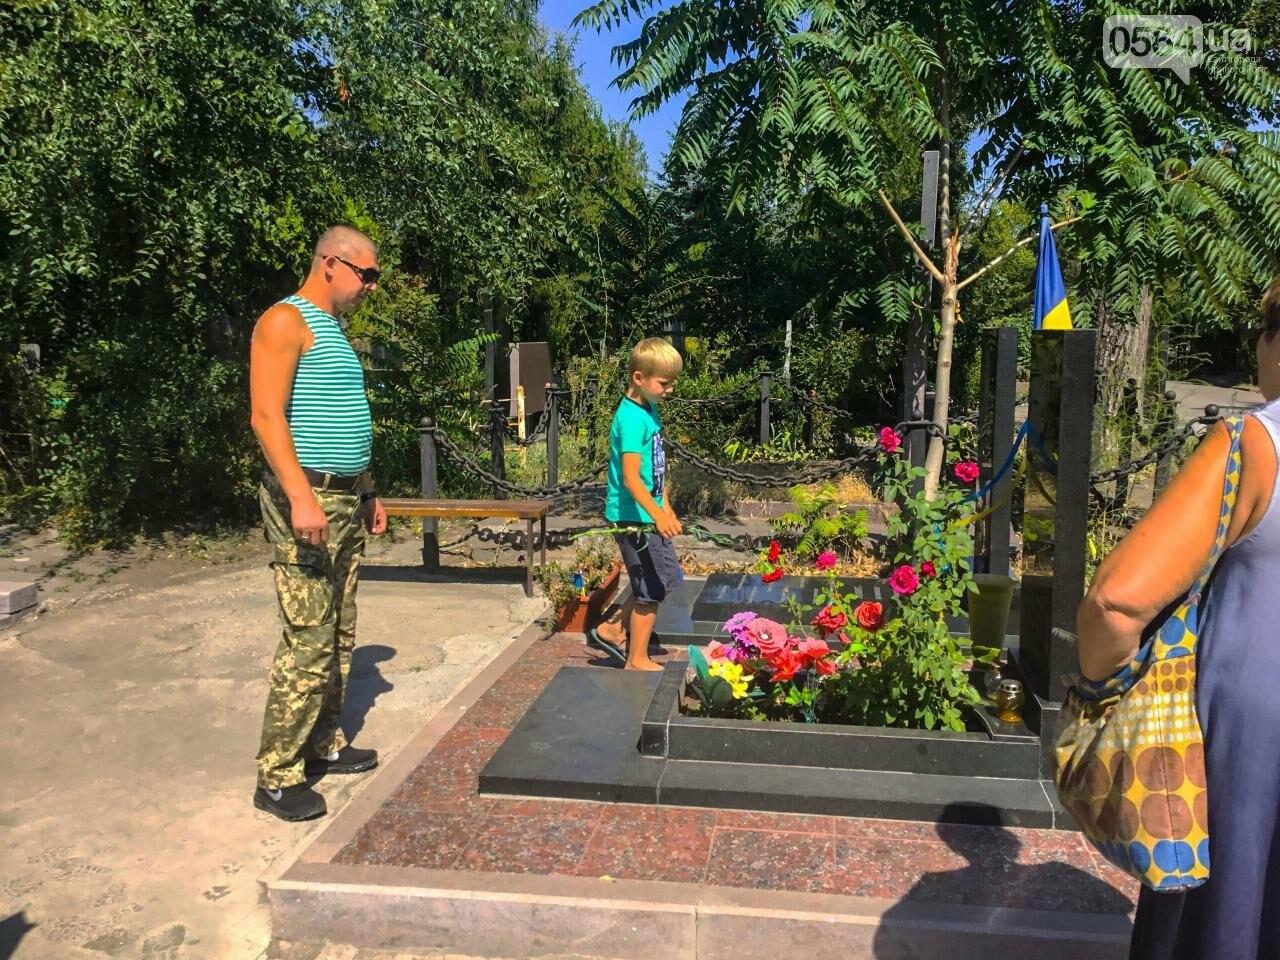 На Аллее Героев провели панихиду по погибшим в зоне АТО криворожанам, - ФОТО , фото-19